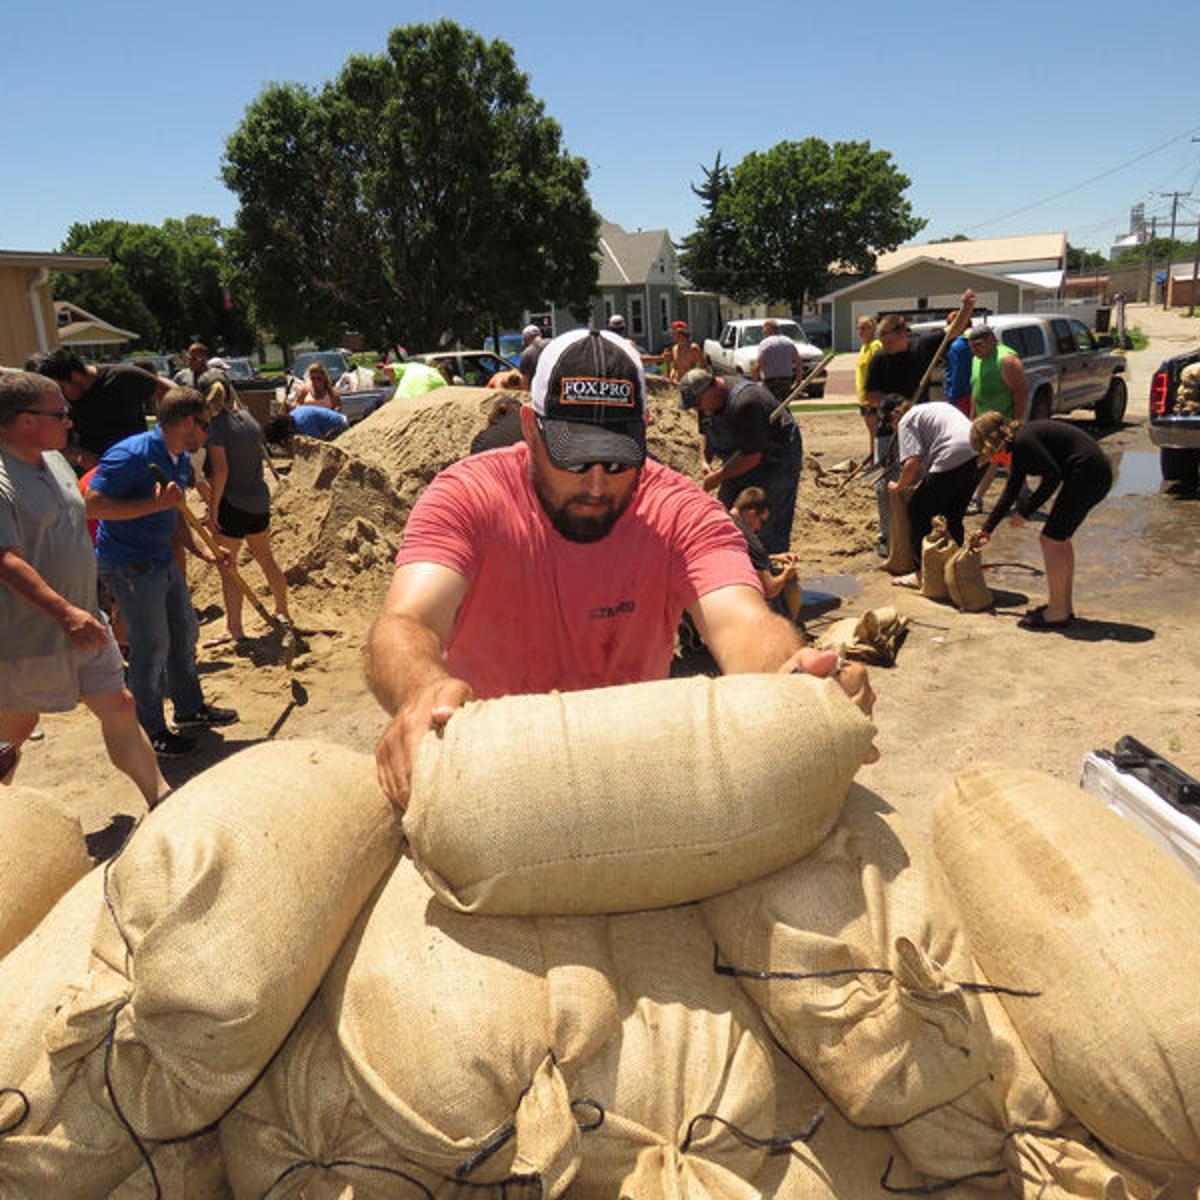 Deadline to register for federal disaster assistance is